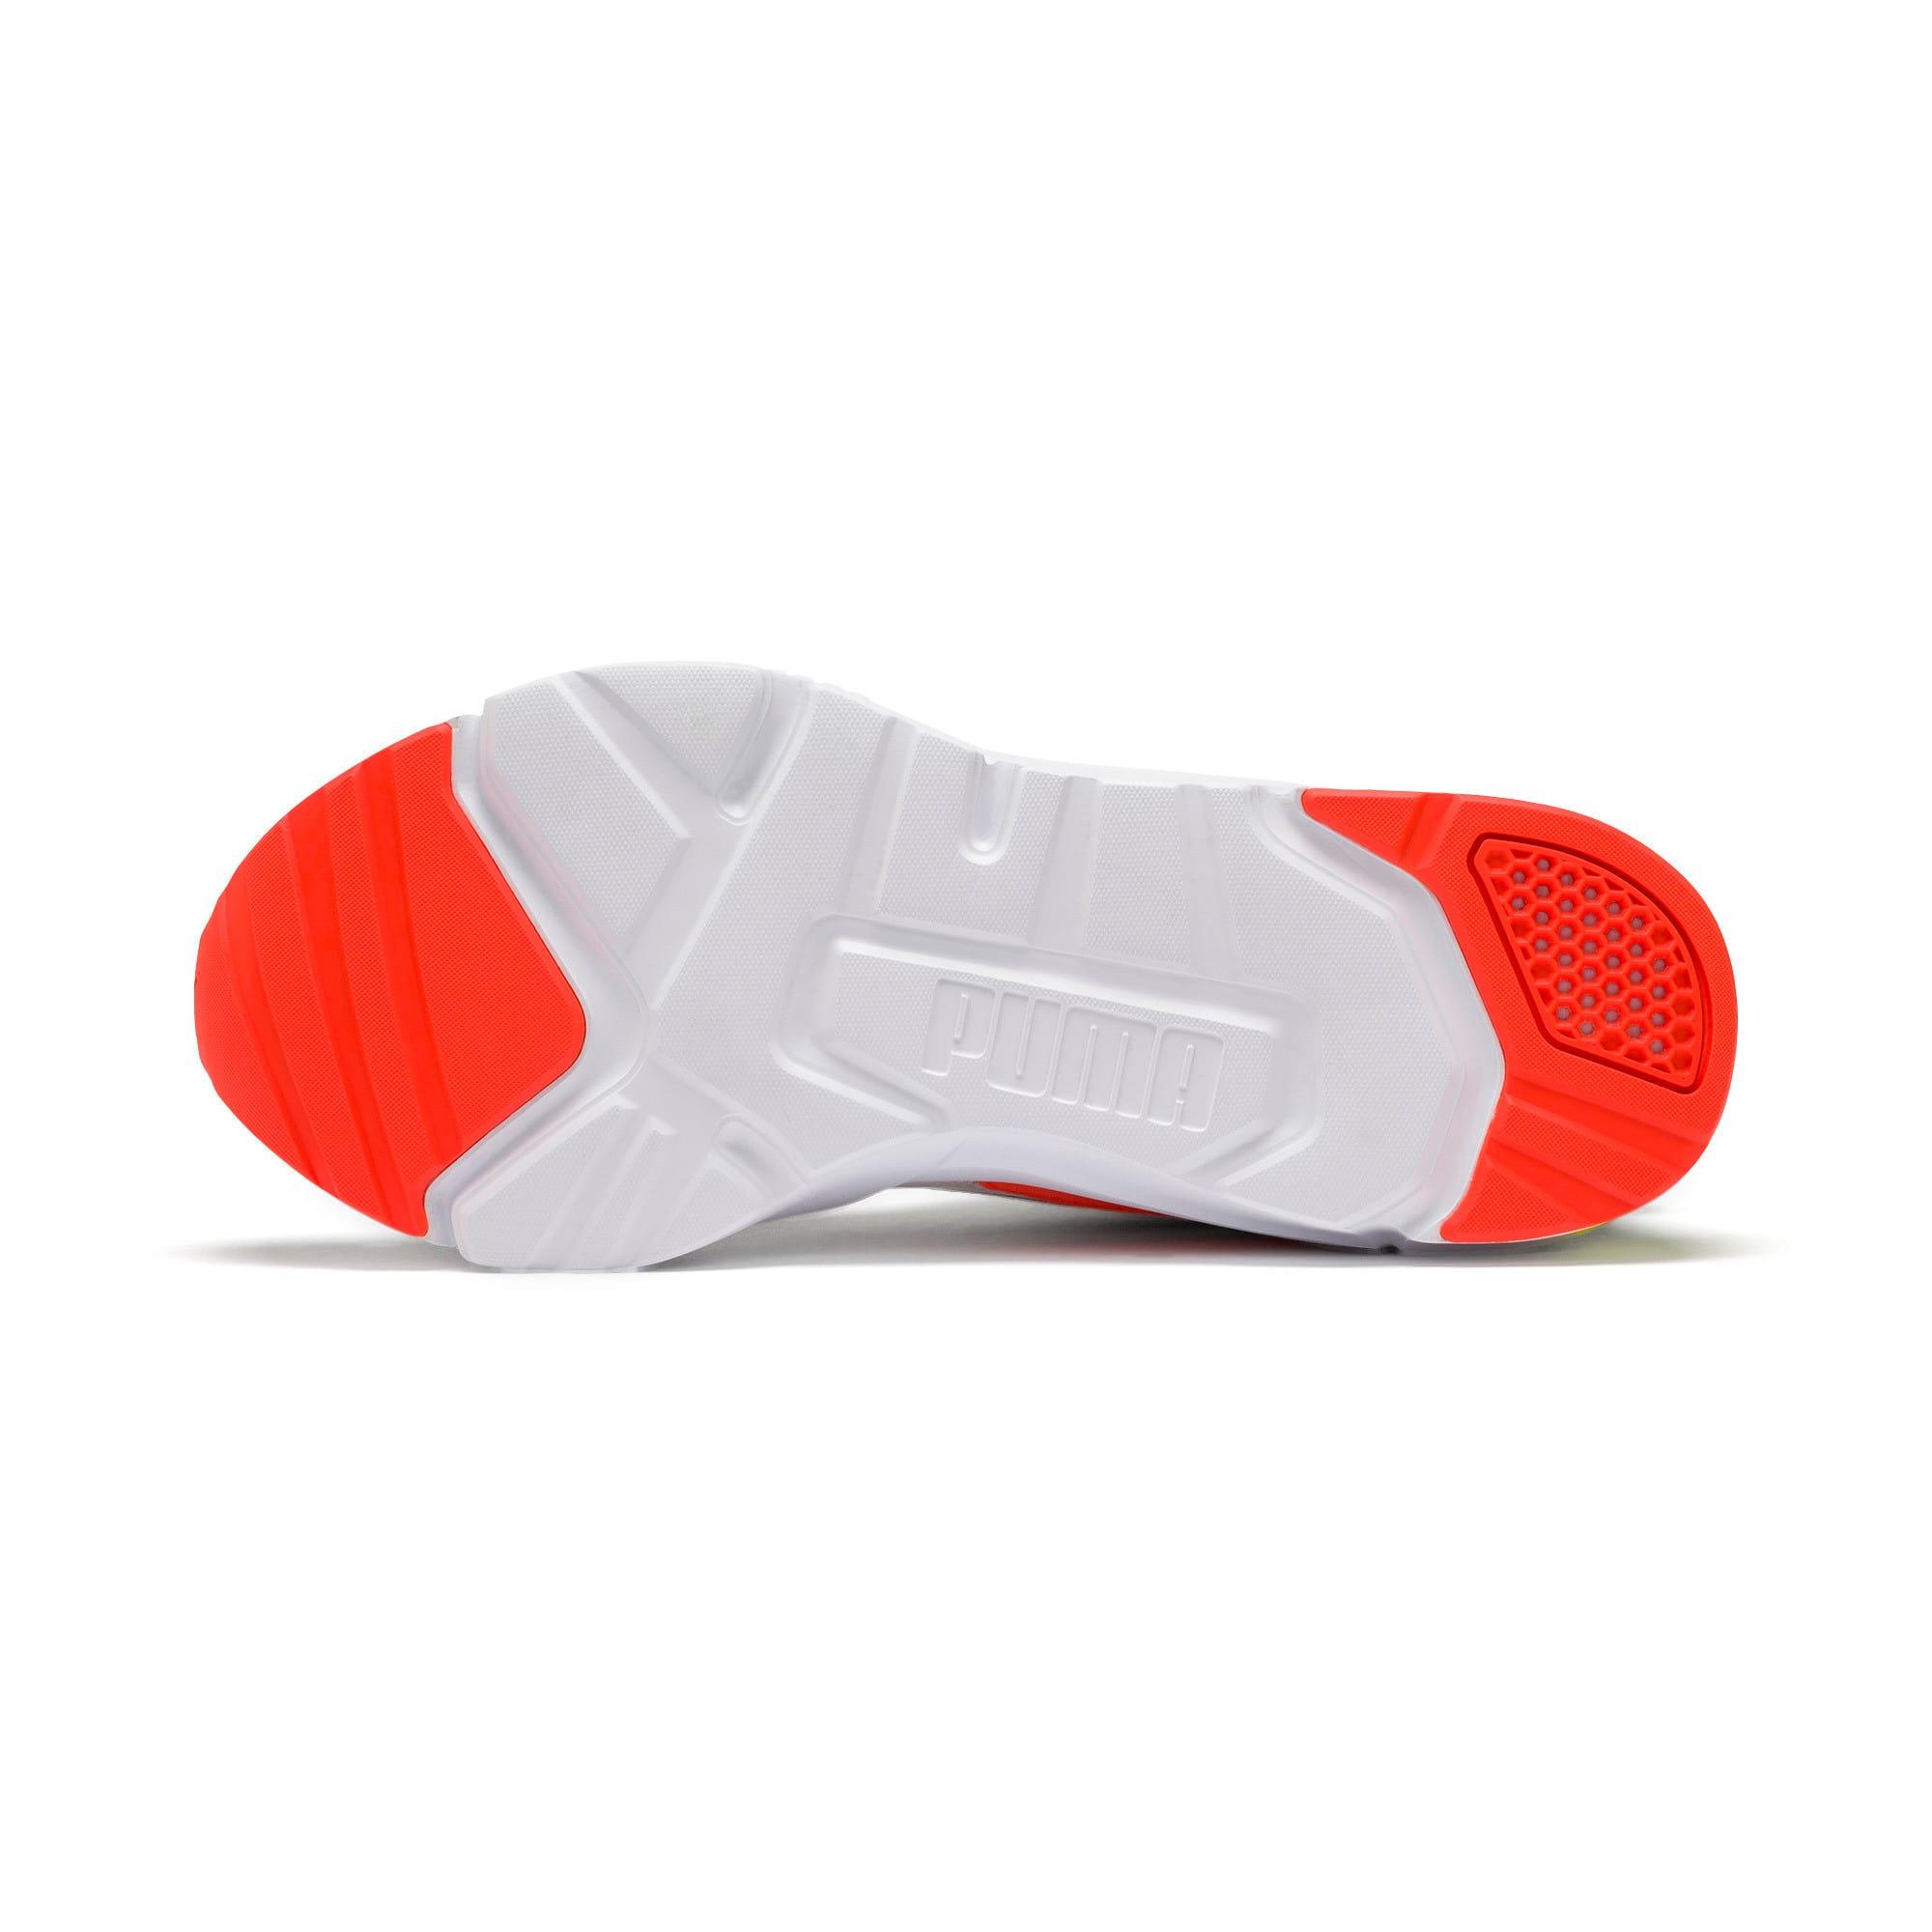 Thumbnail 4 of CELL Phase Men's Training Shoes, White-GalaxyBlue-YellowAlert, medium